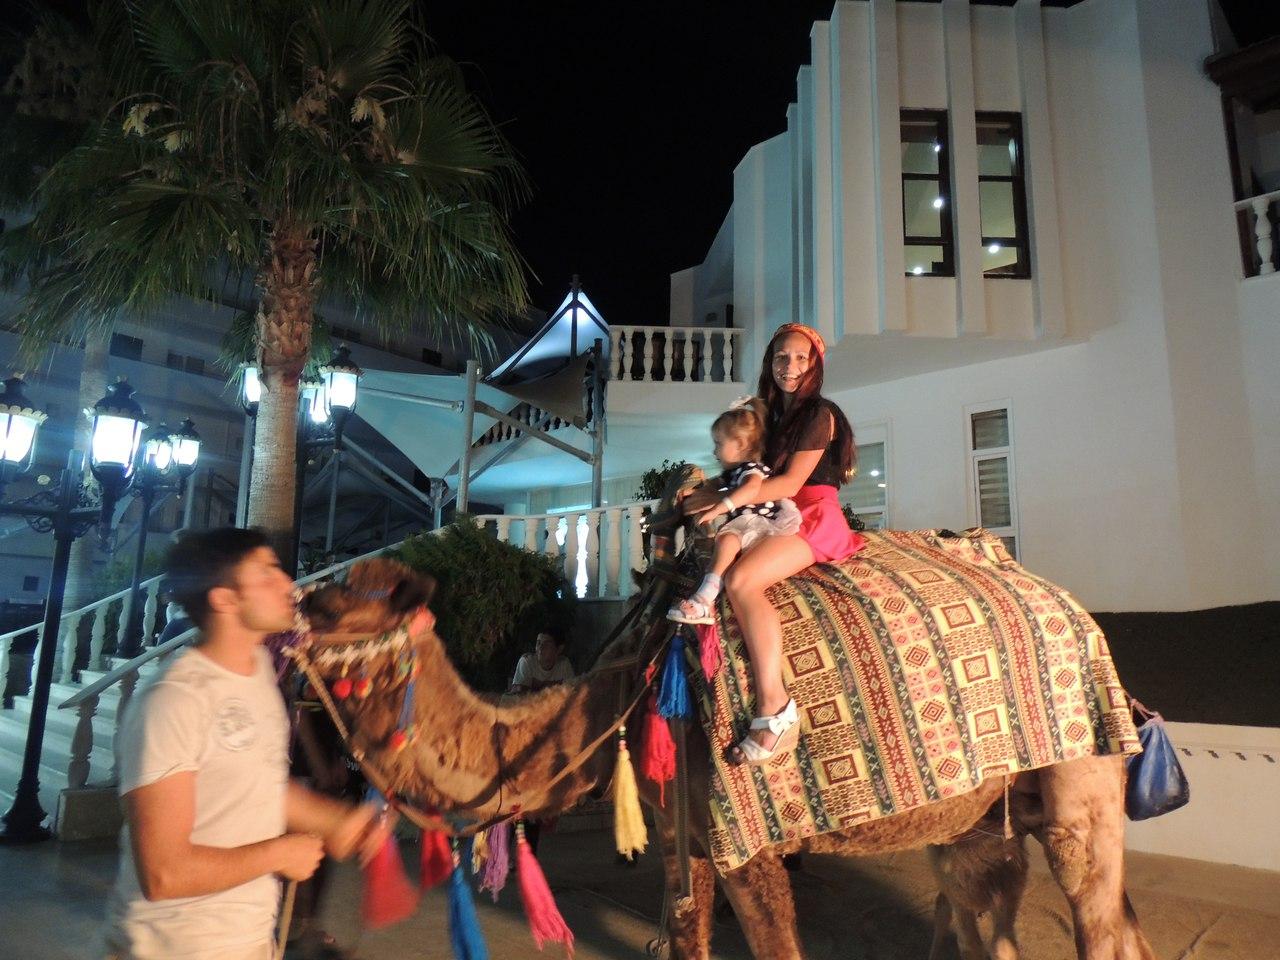 Можно вечером покататься на верблюде в Xeno Hotels Club Mare Клуб Белла Маре